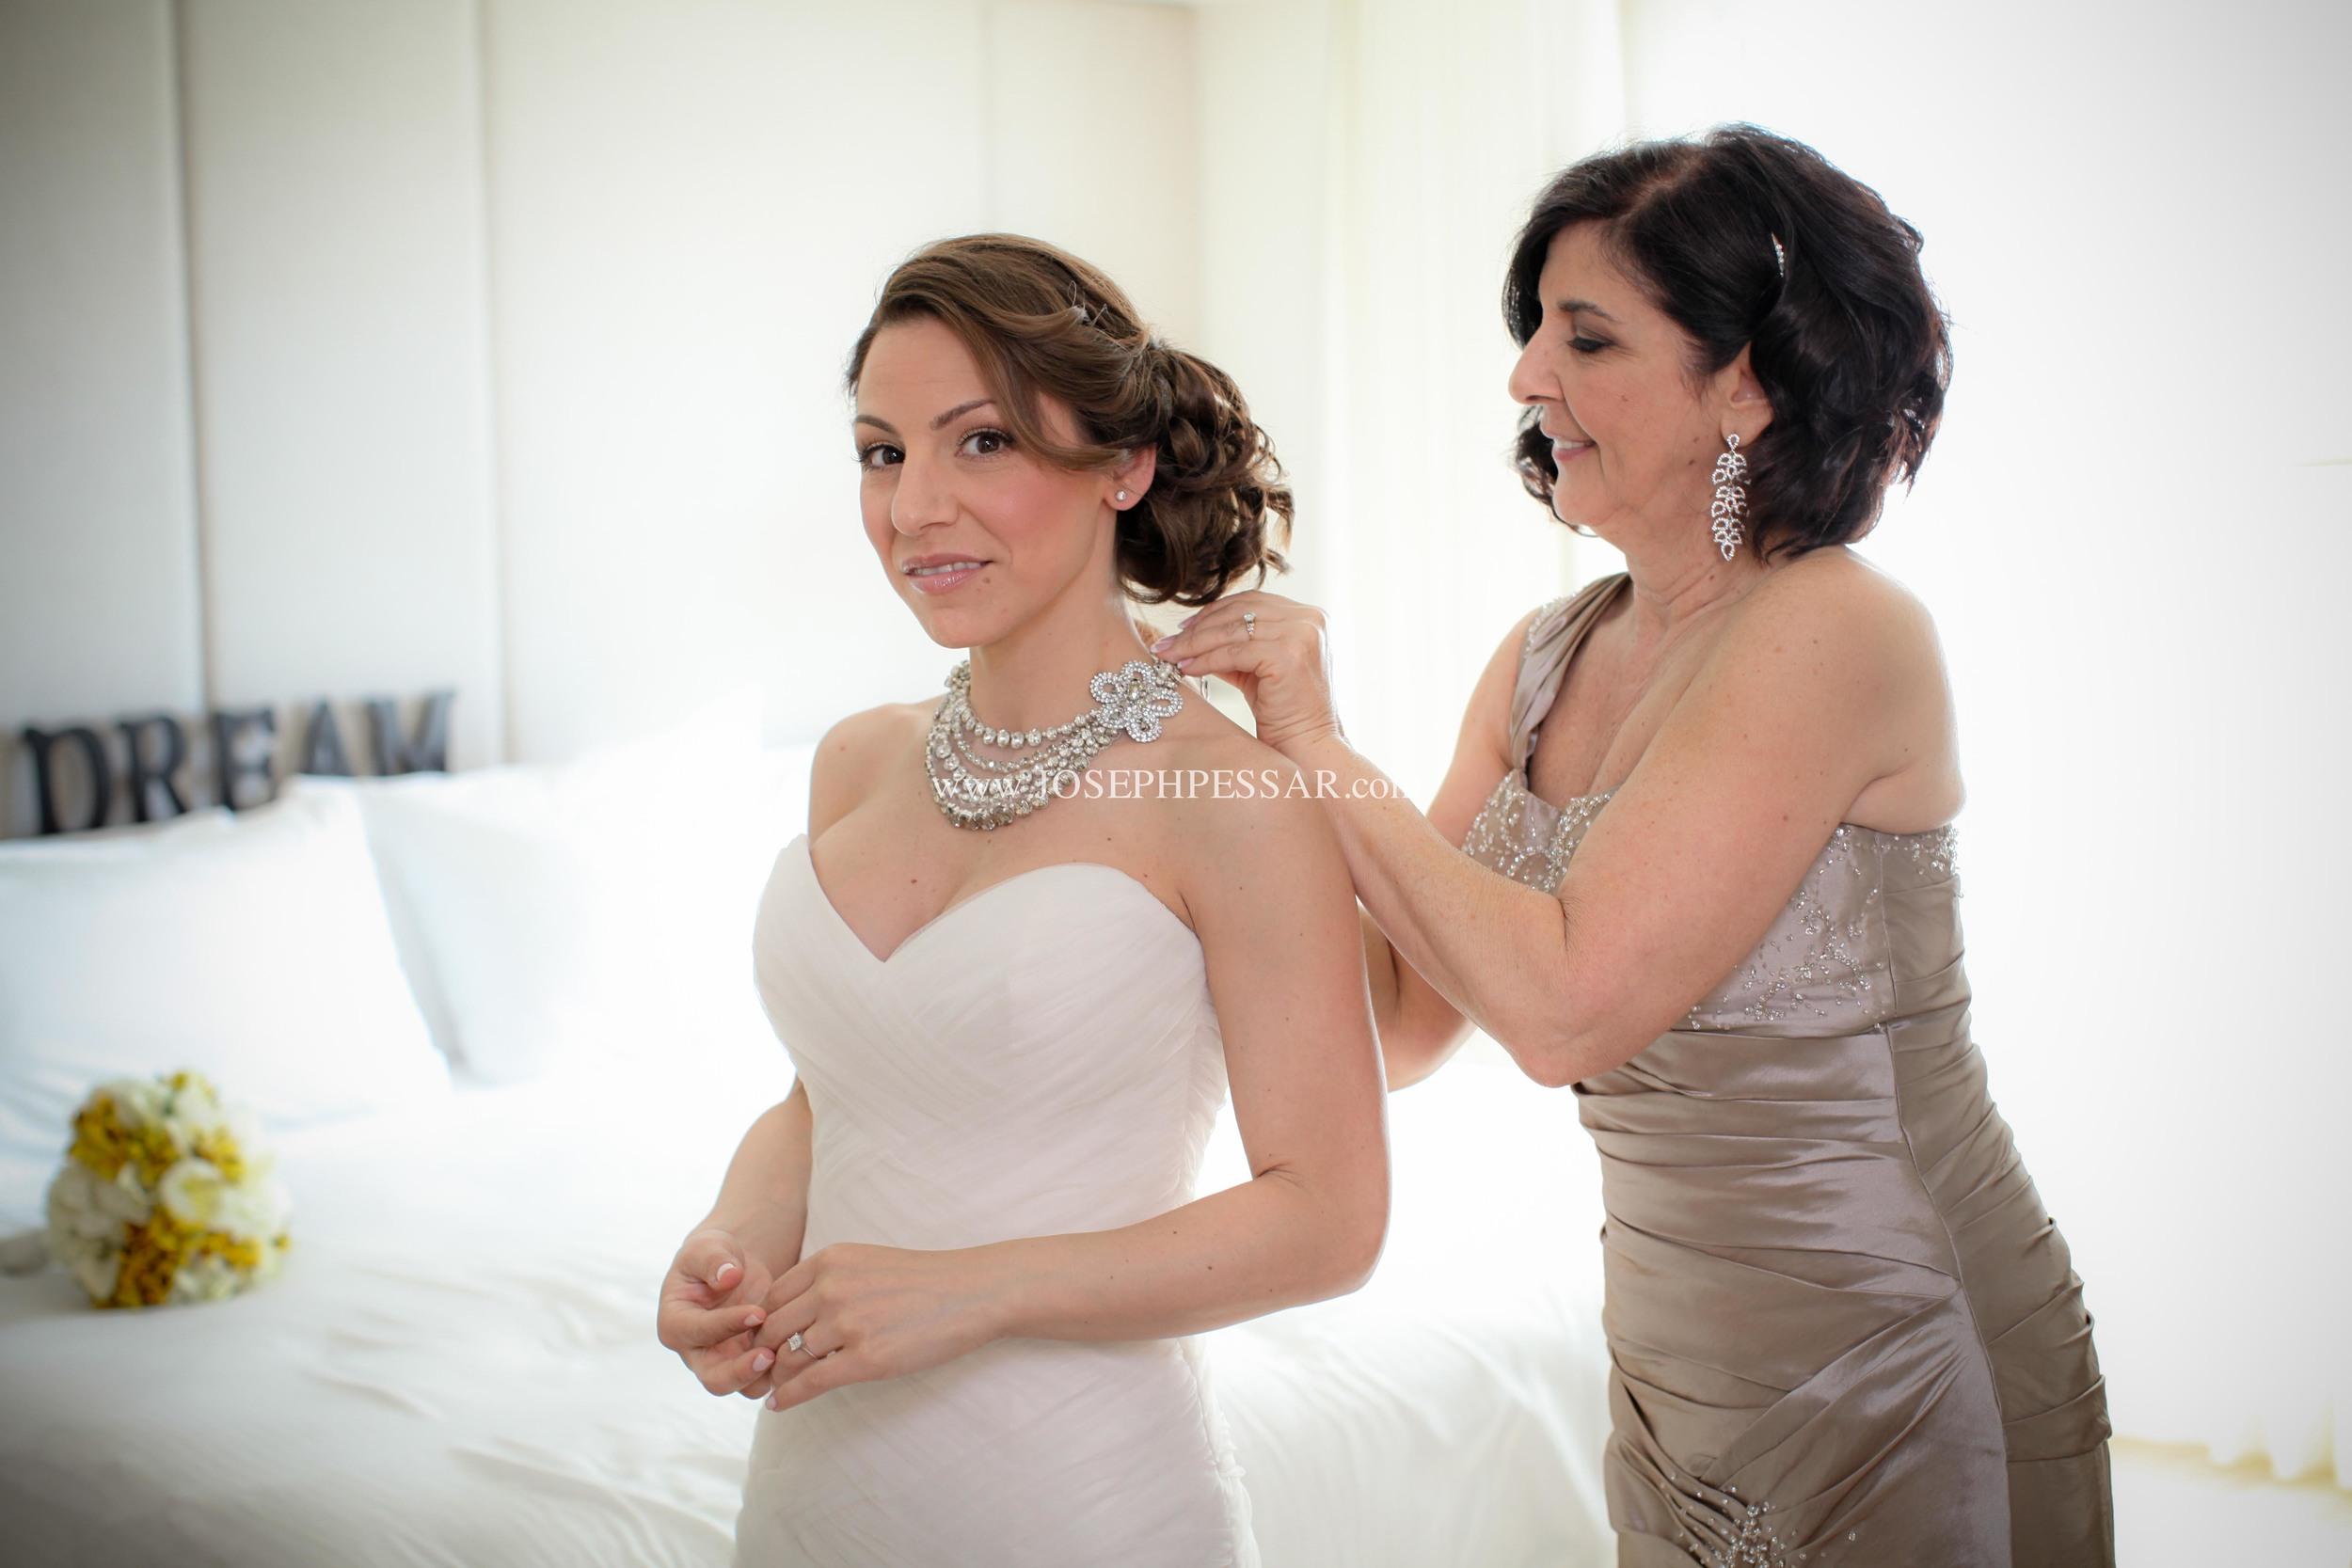 nyc_wedding_photographer0011.jpg